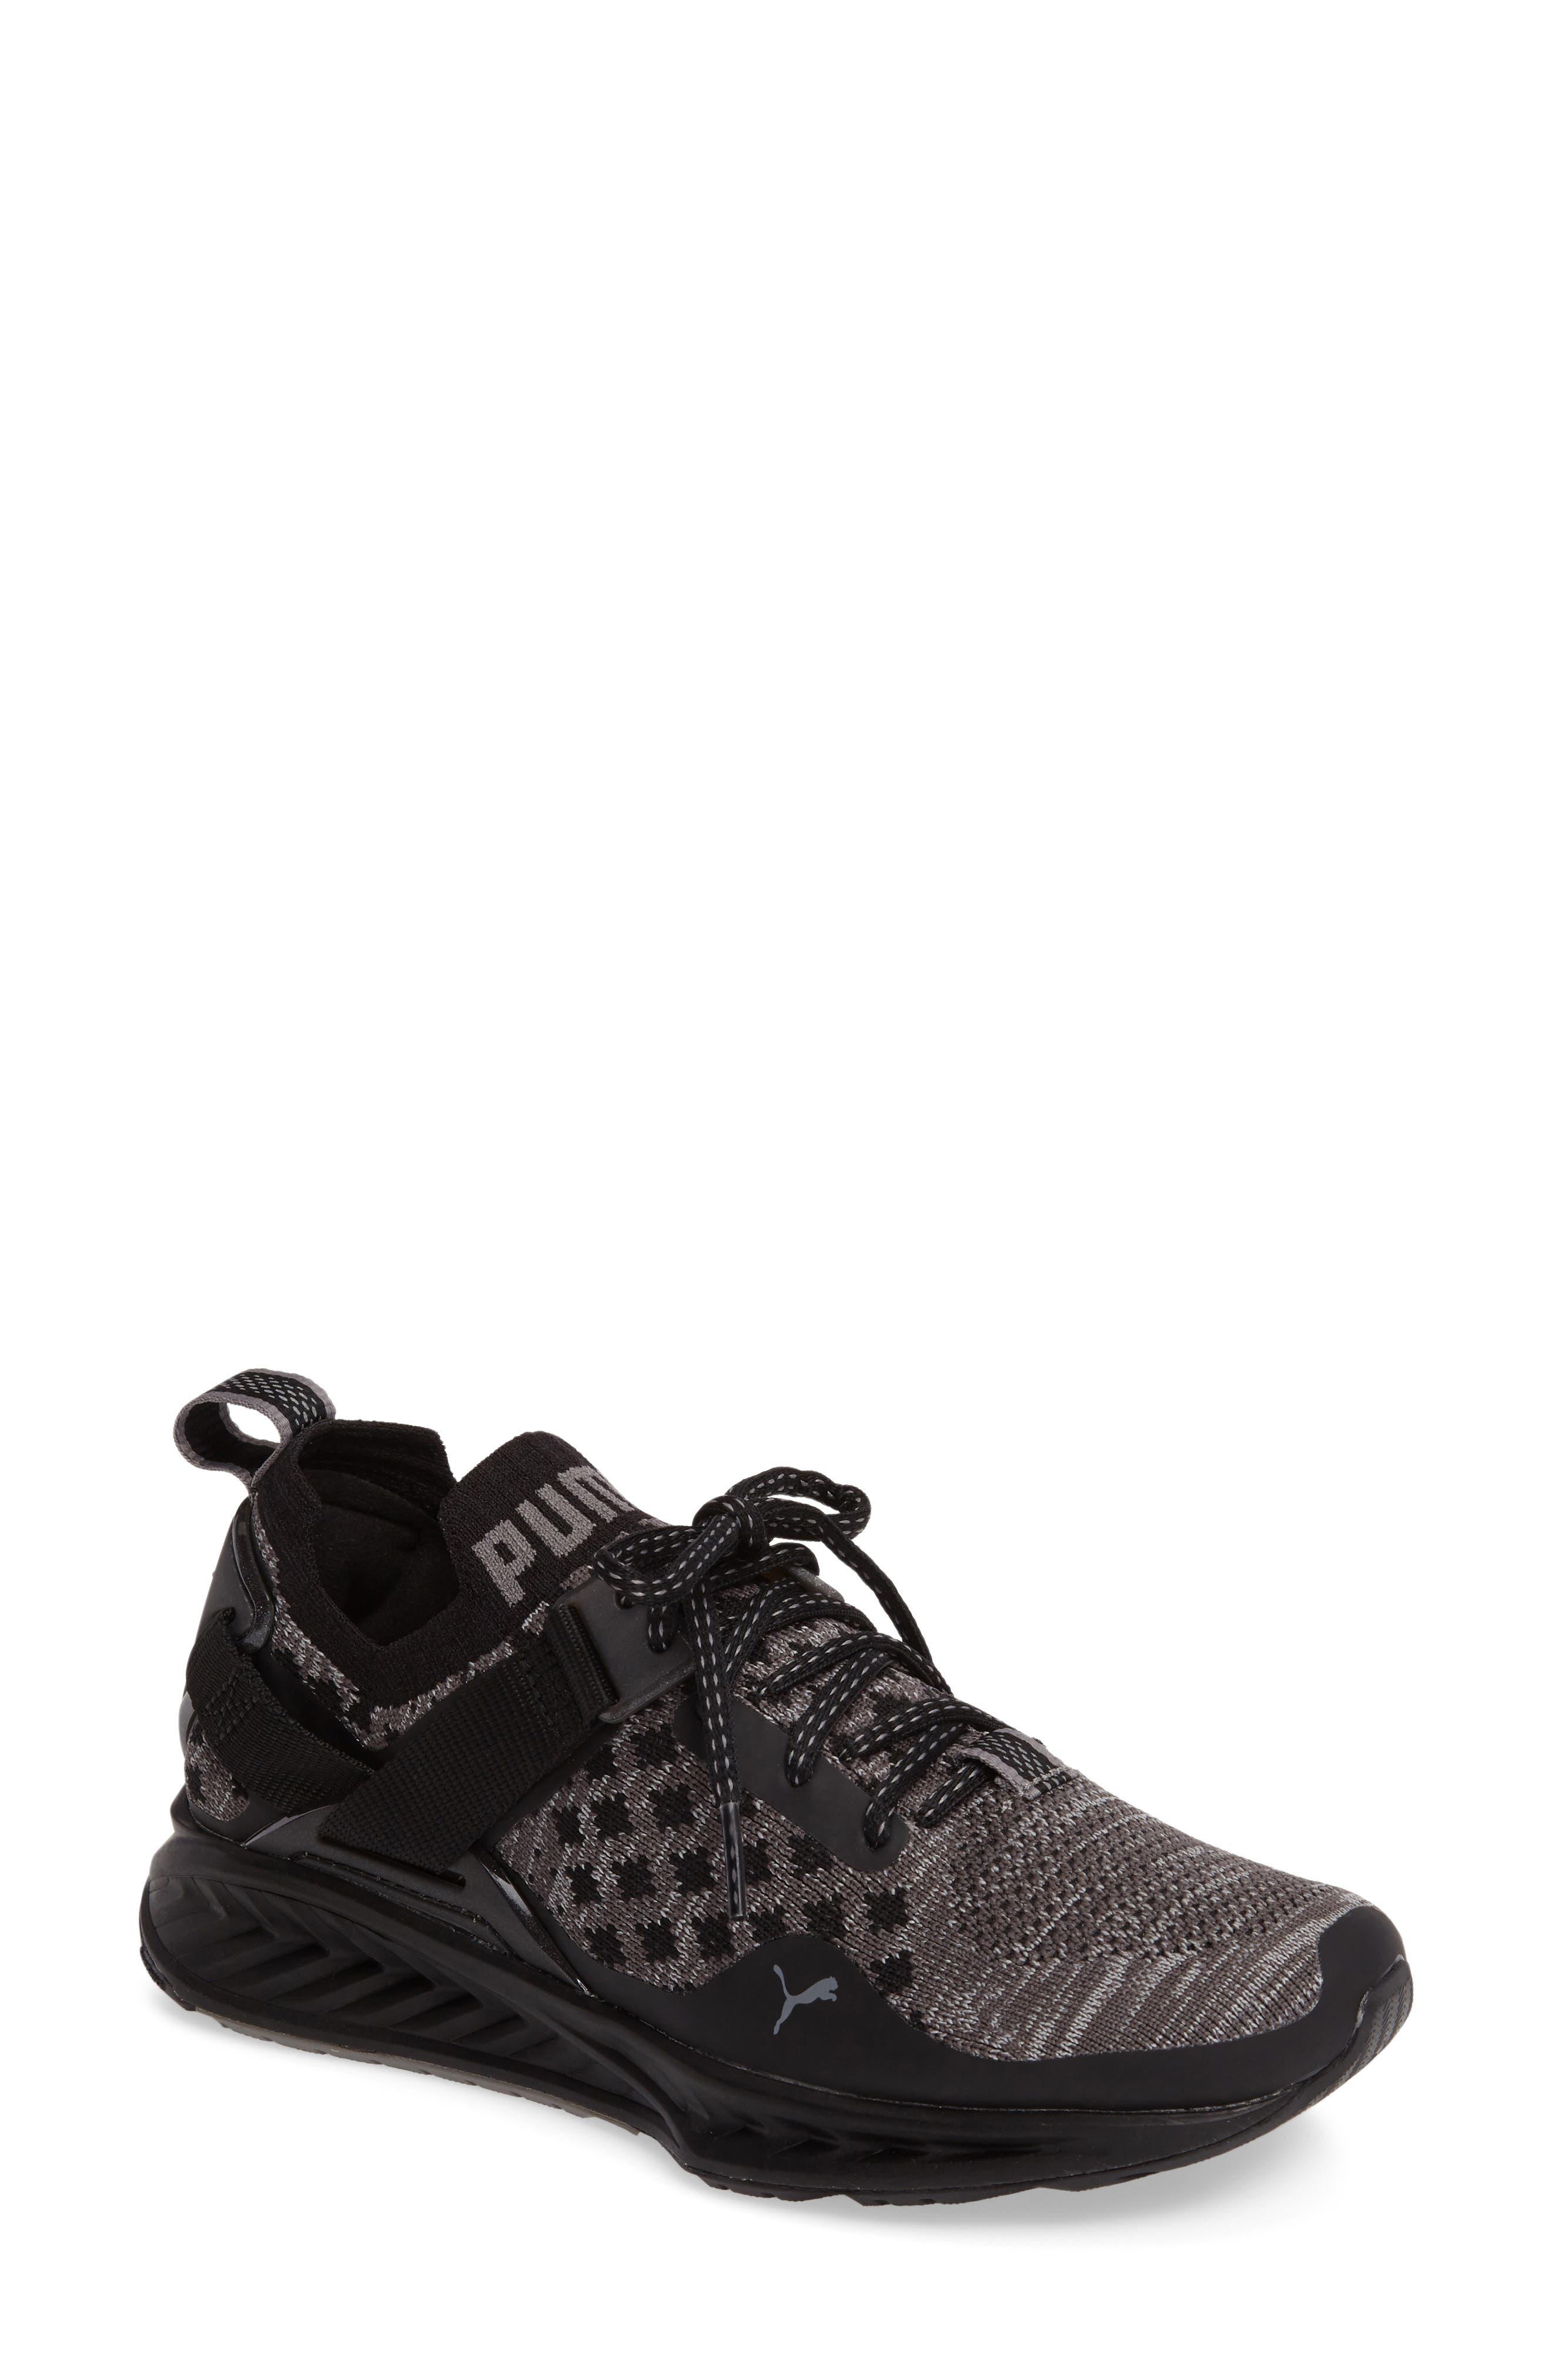 Alternate Image 1 Selected - PUMA IGNITE evoKNIT Low Sneaker (Women)